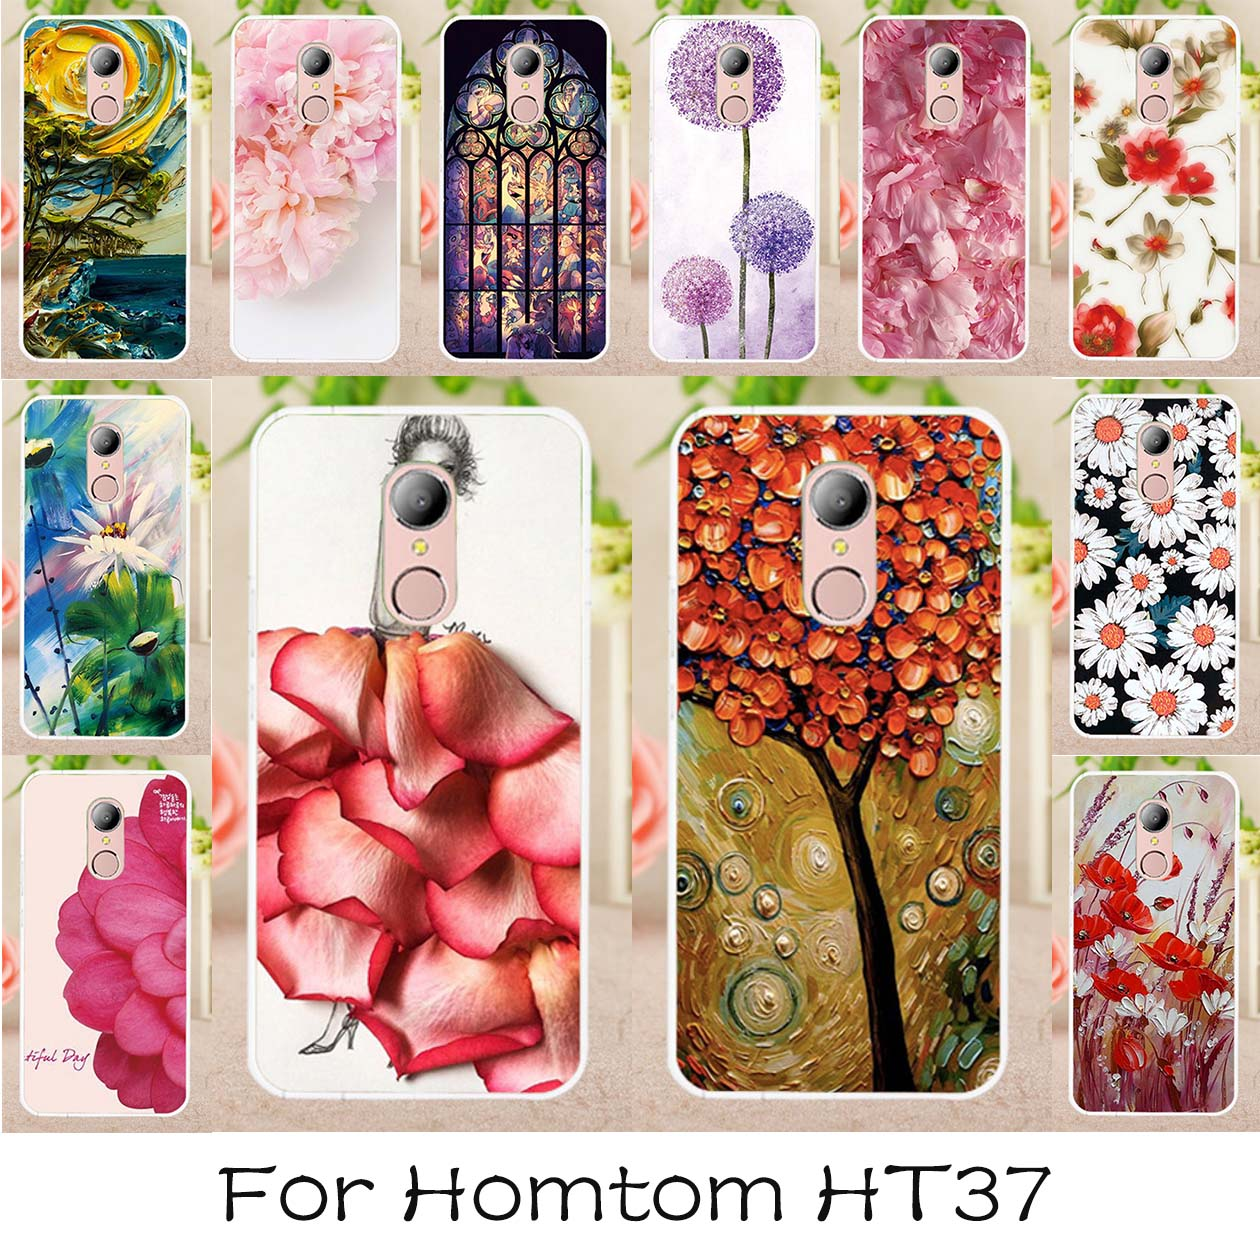 AKABEILA סיליקון טלפון כיסוי מקרה עבור HOMTOM HT37 HOMTOM HT37 Pro 5.0 inch רך TPU נרתיקים צבועים בחזרה מכסה מעטה הוד